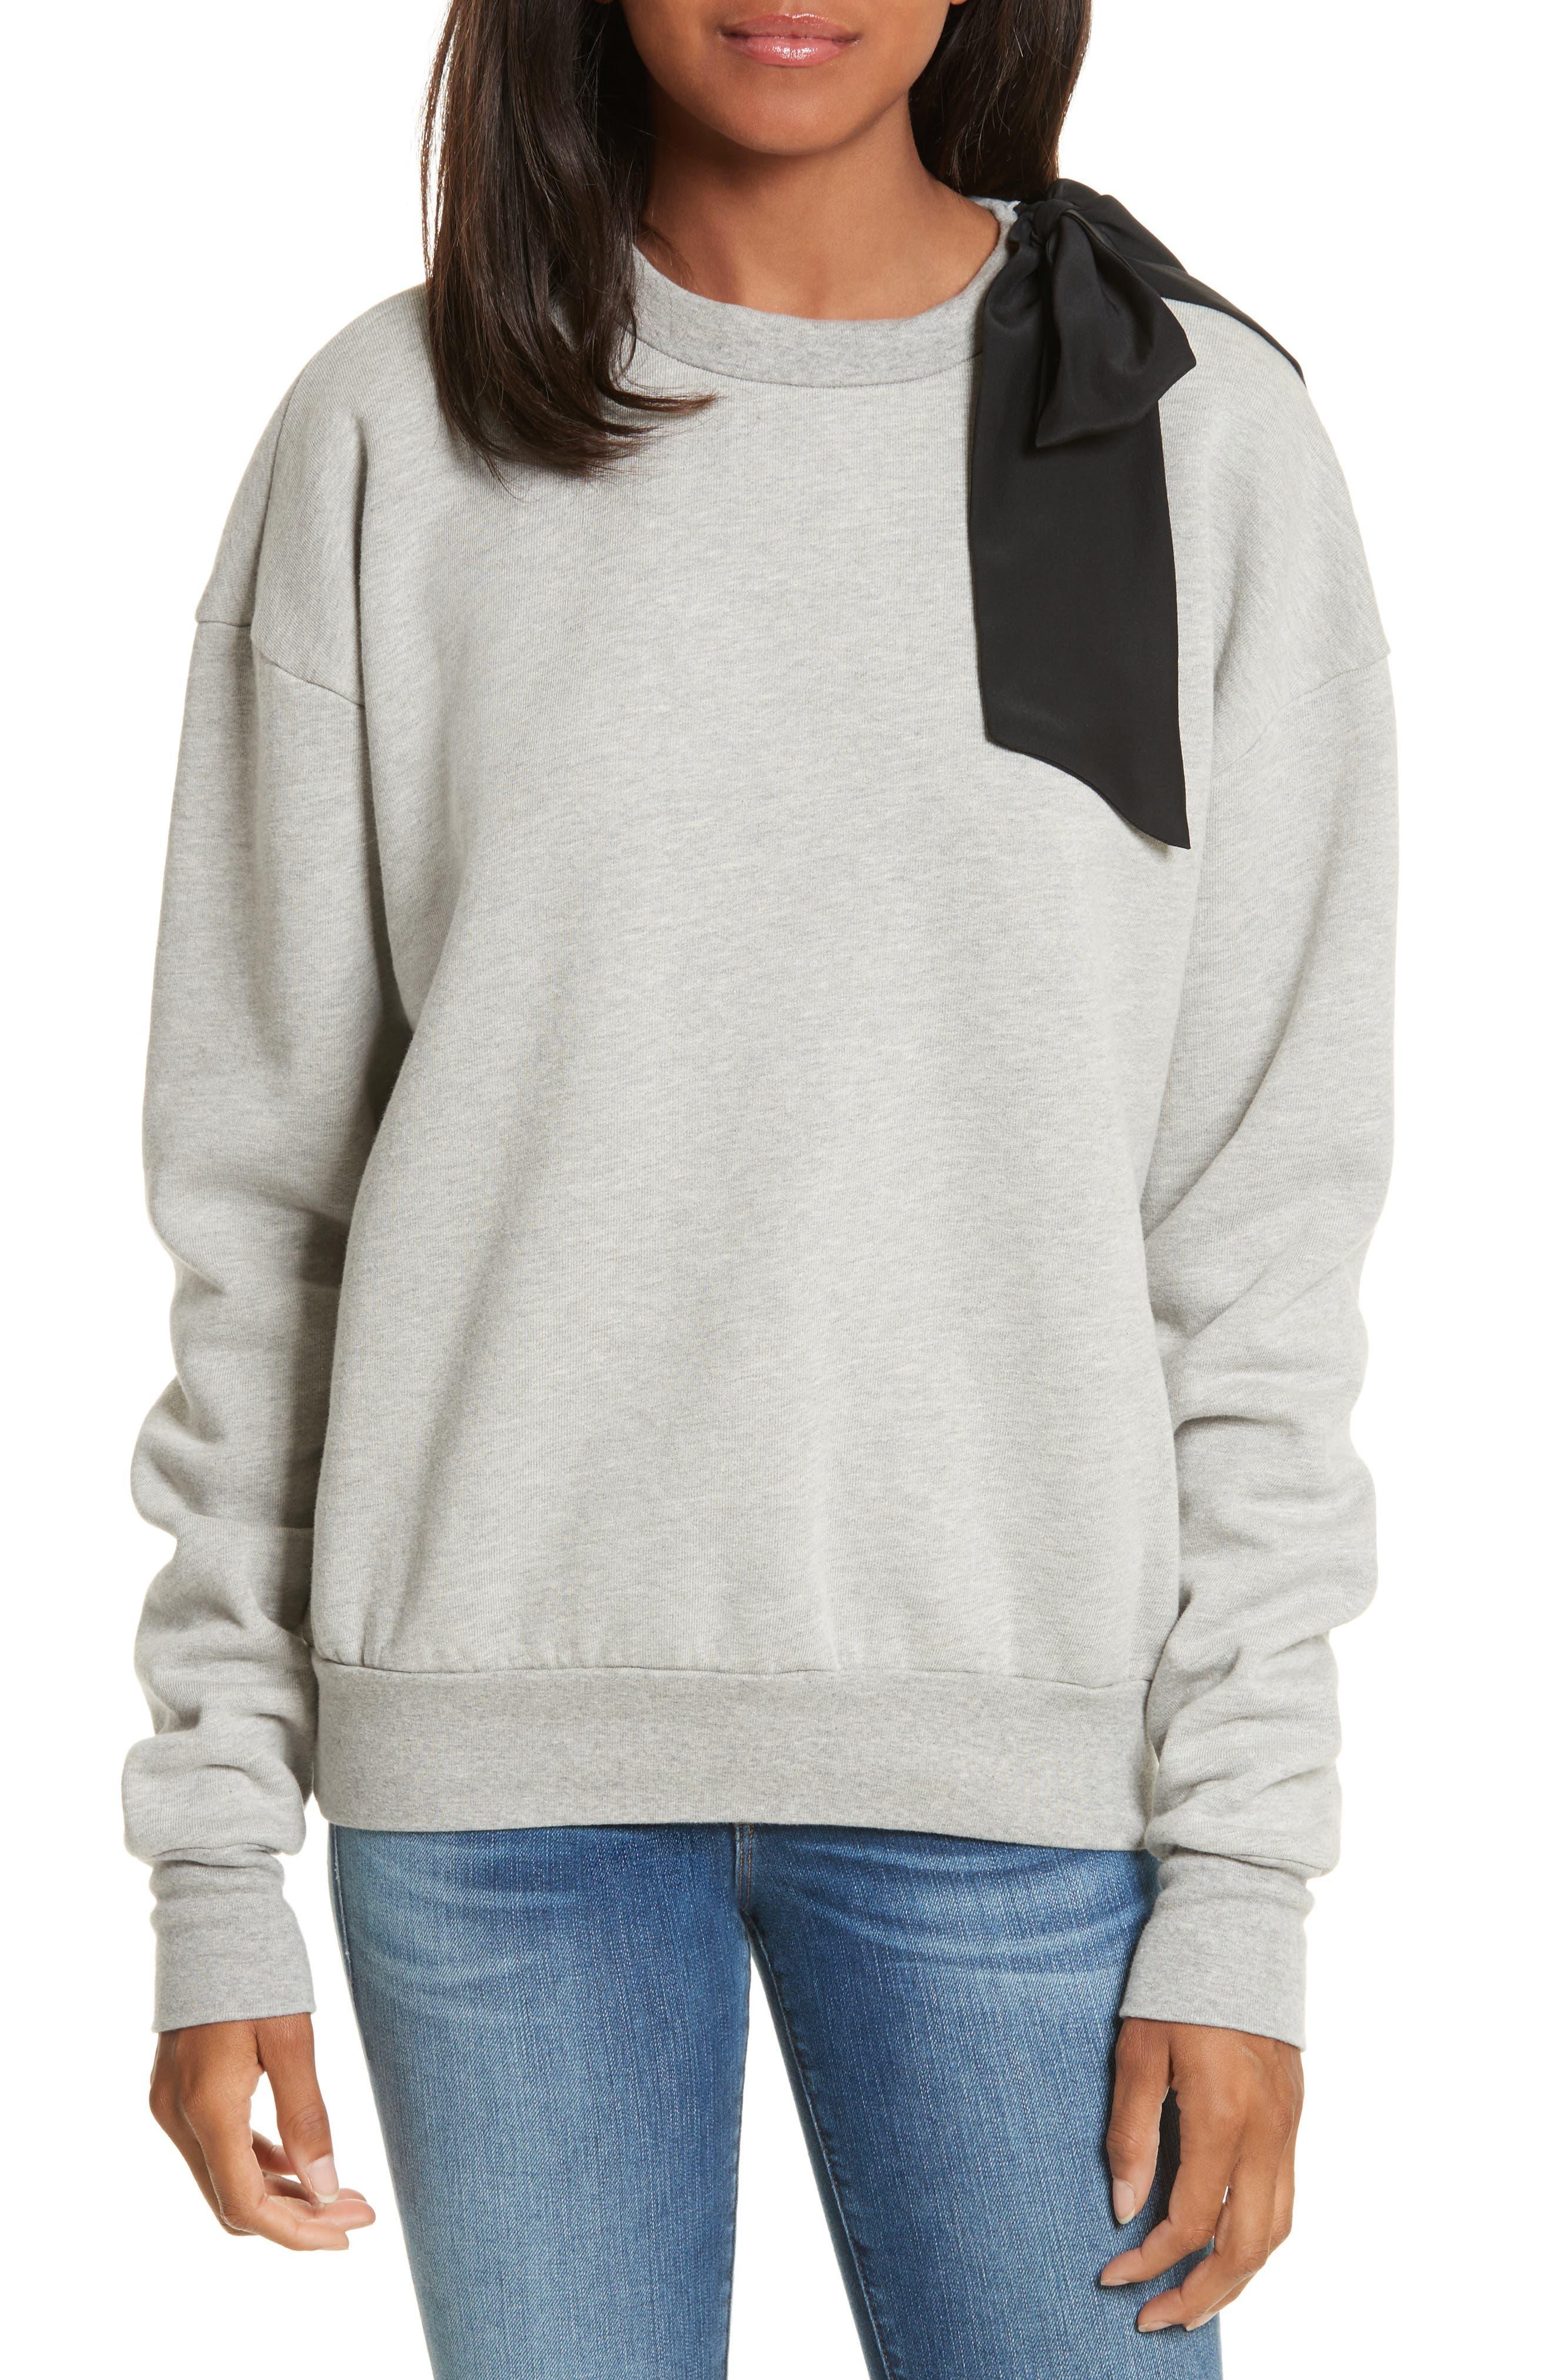 Bow Sweatshirt,                             Main thumbnail 1, color,                             021